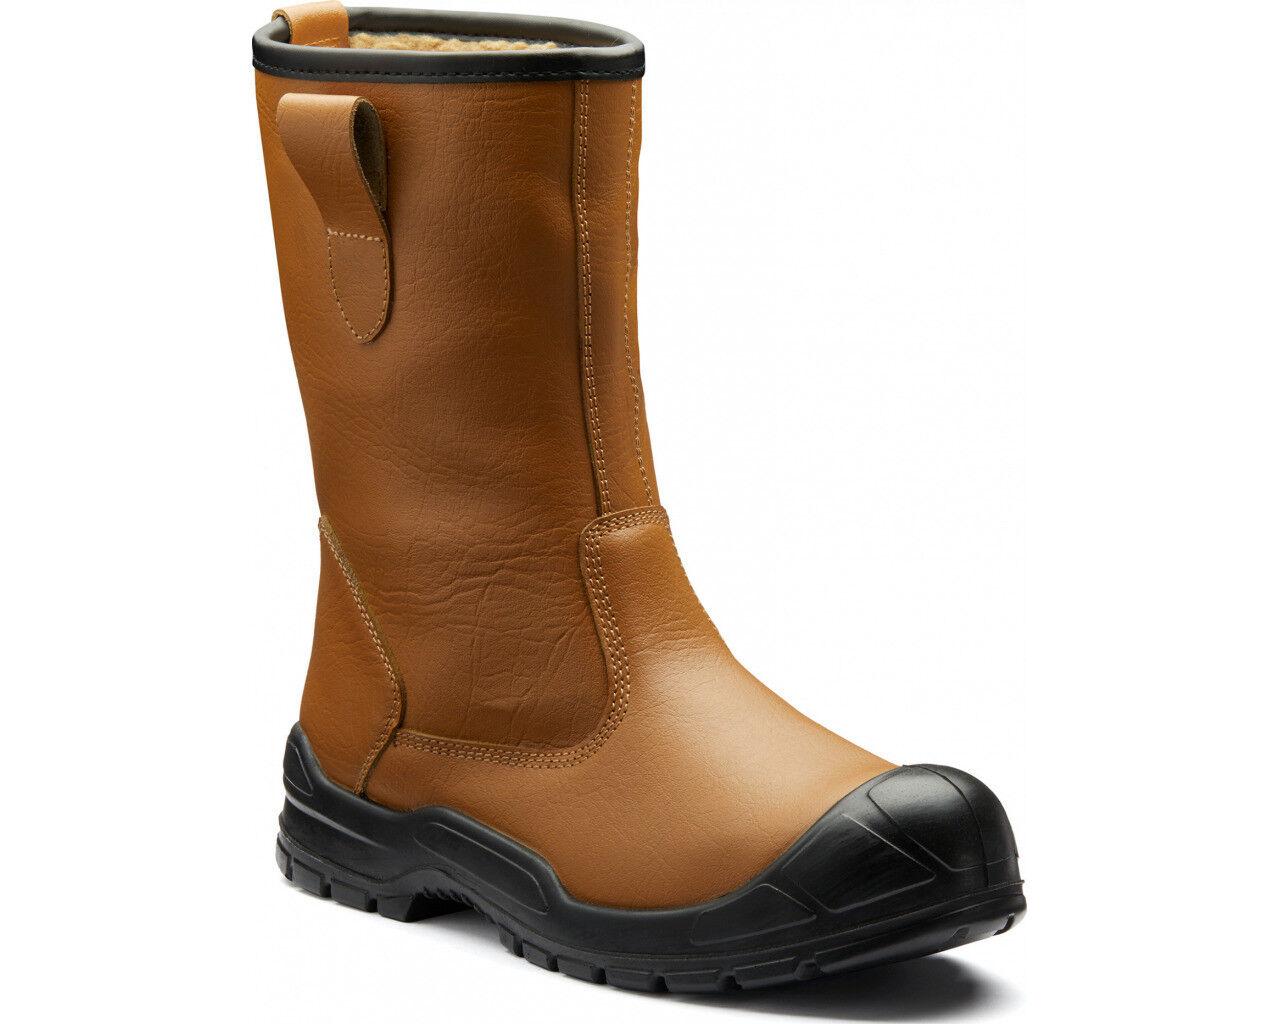 Dickies Pelliccia Dixon Rigger Stivali Di Sicurezza Da Uomo Impermeabile Pelliccia Dickies con Punta in Acciaio ef0d0a